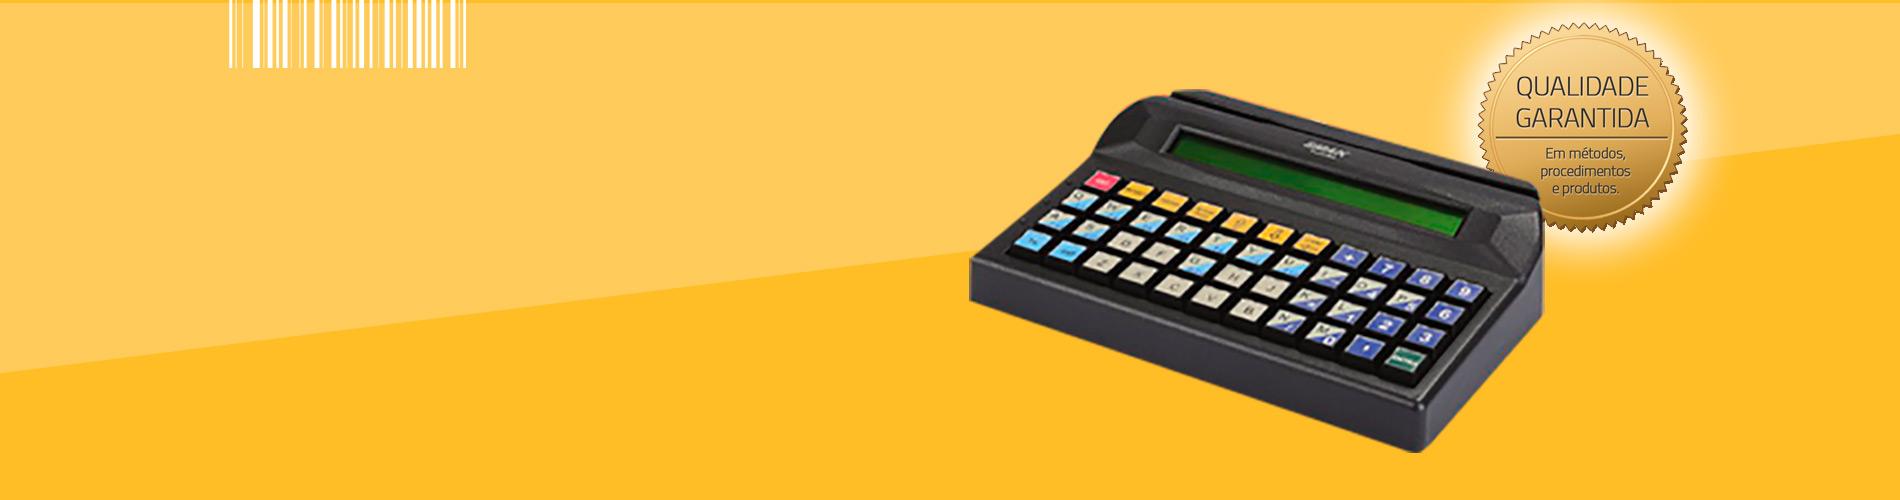 Por que comprar um teclado SMAK SKO 44?